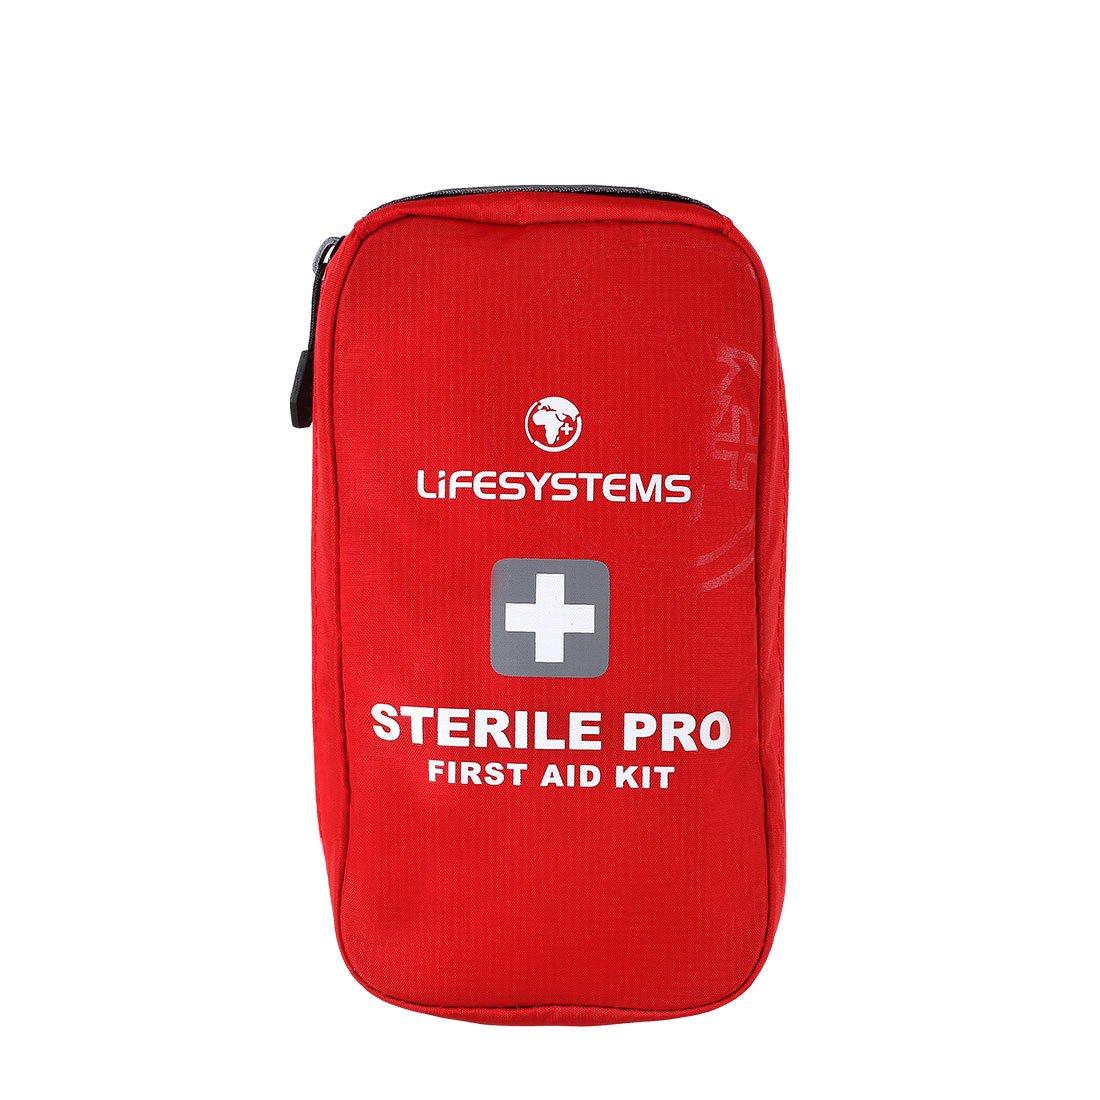 Sterile Pro First Aid Kit Travel Lifesystems Nurse Standart